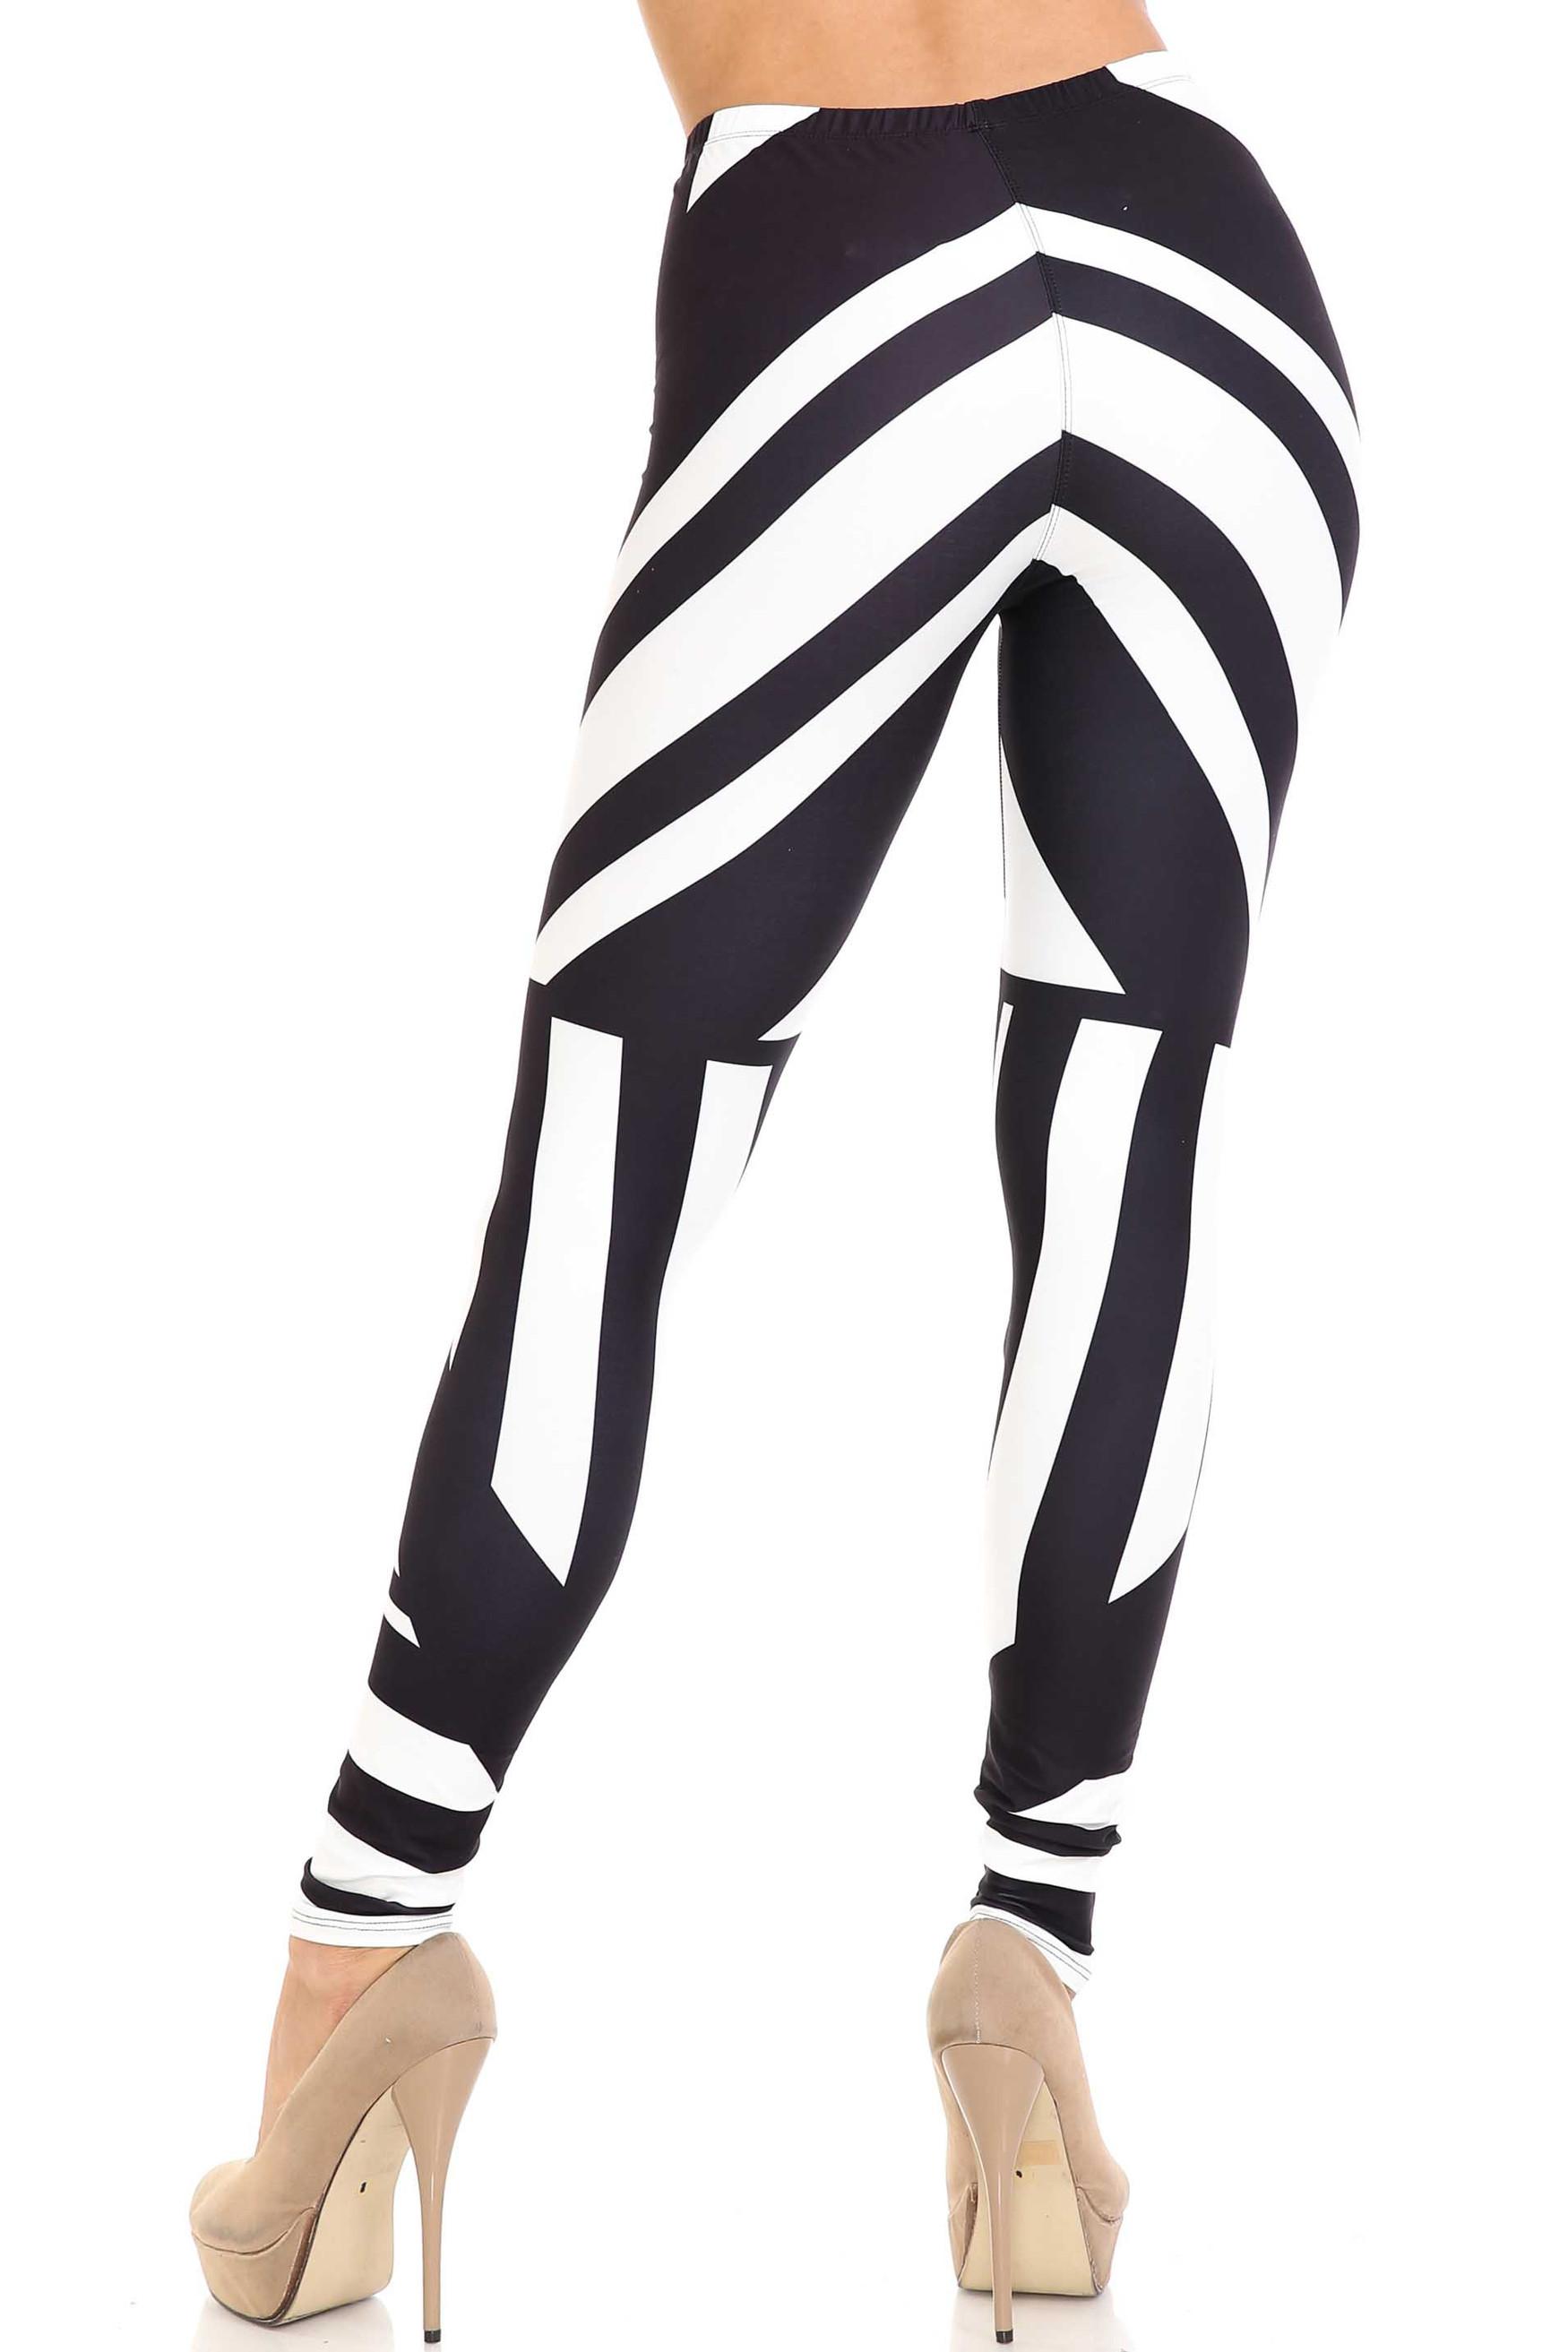 Creamy Soft Body Flatter Lines Extra Plus Size Leggings - 3X-5X - USA Fashion™